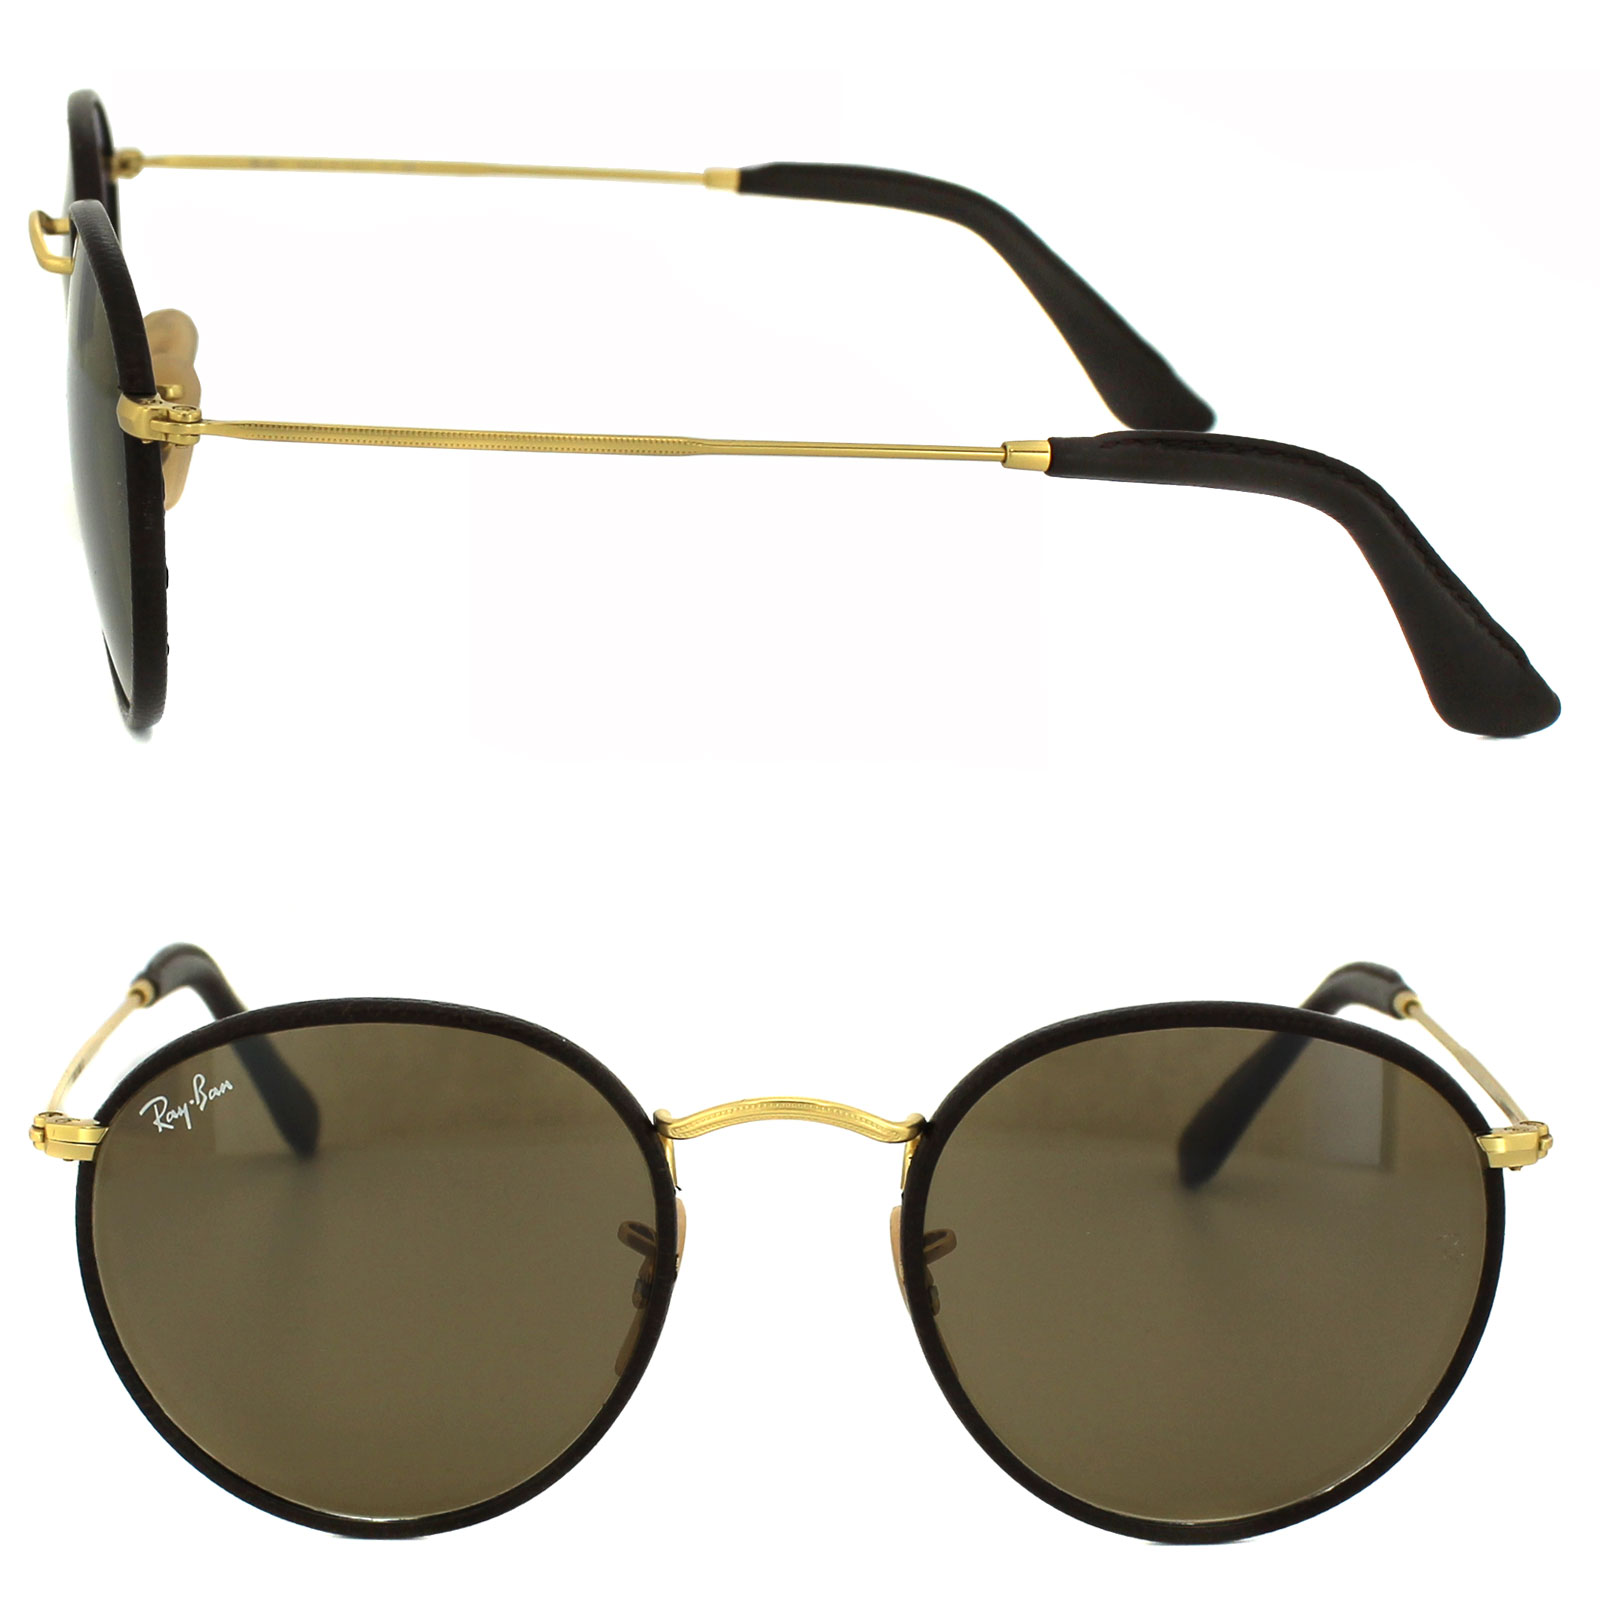 2b2299b248 RayBan Sunglasses 3475Q 112 53 Matt Gold Brown 805289751755